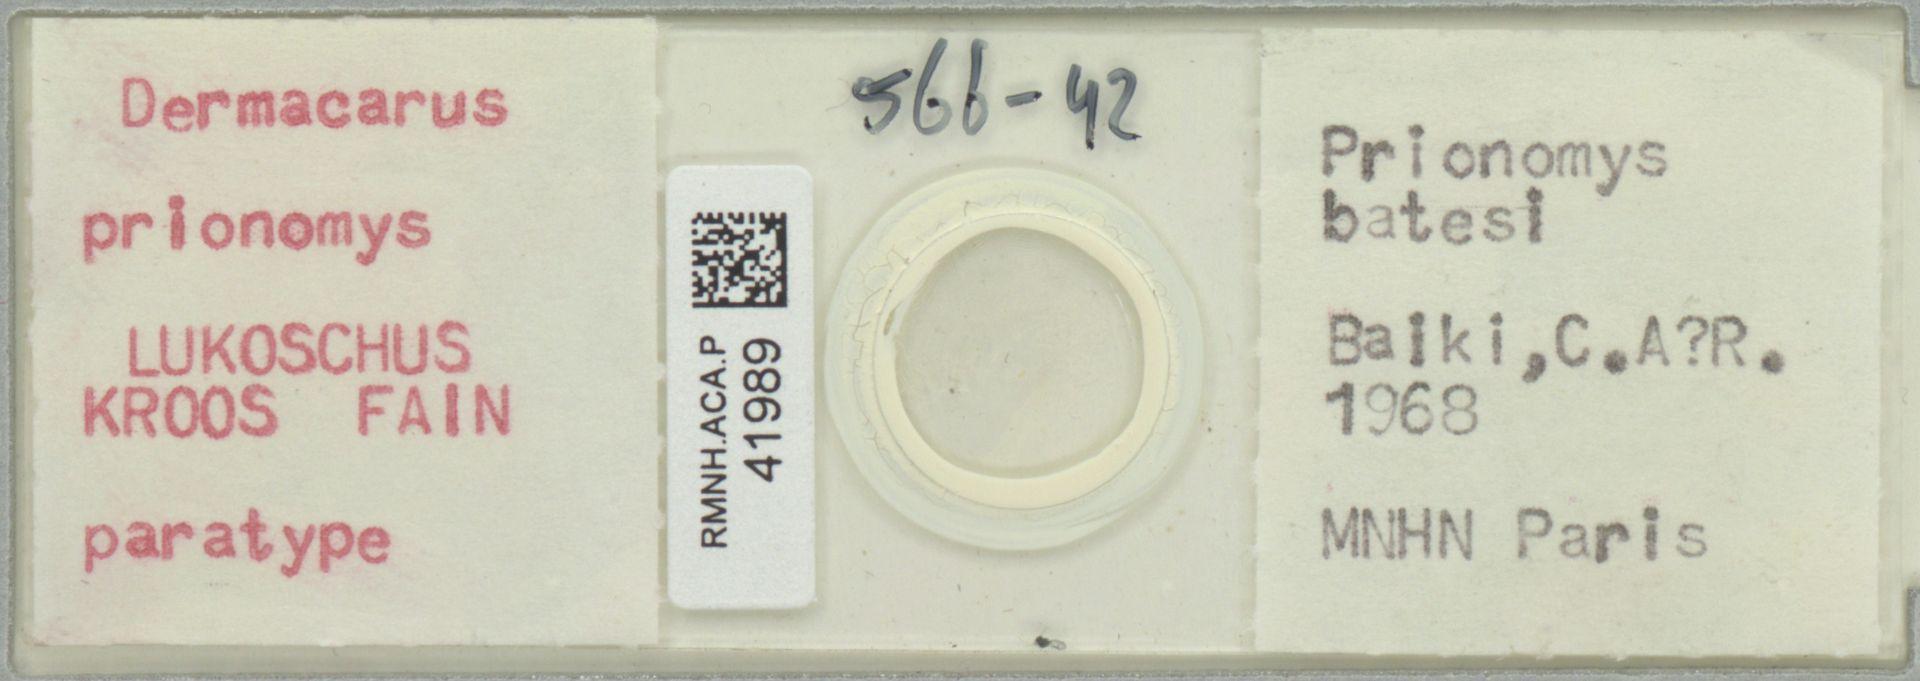 RMNH.ACA.P.41989 | Dermacarus prionomys Lukoschus, Kroos, Fain